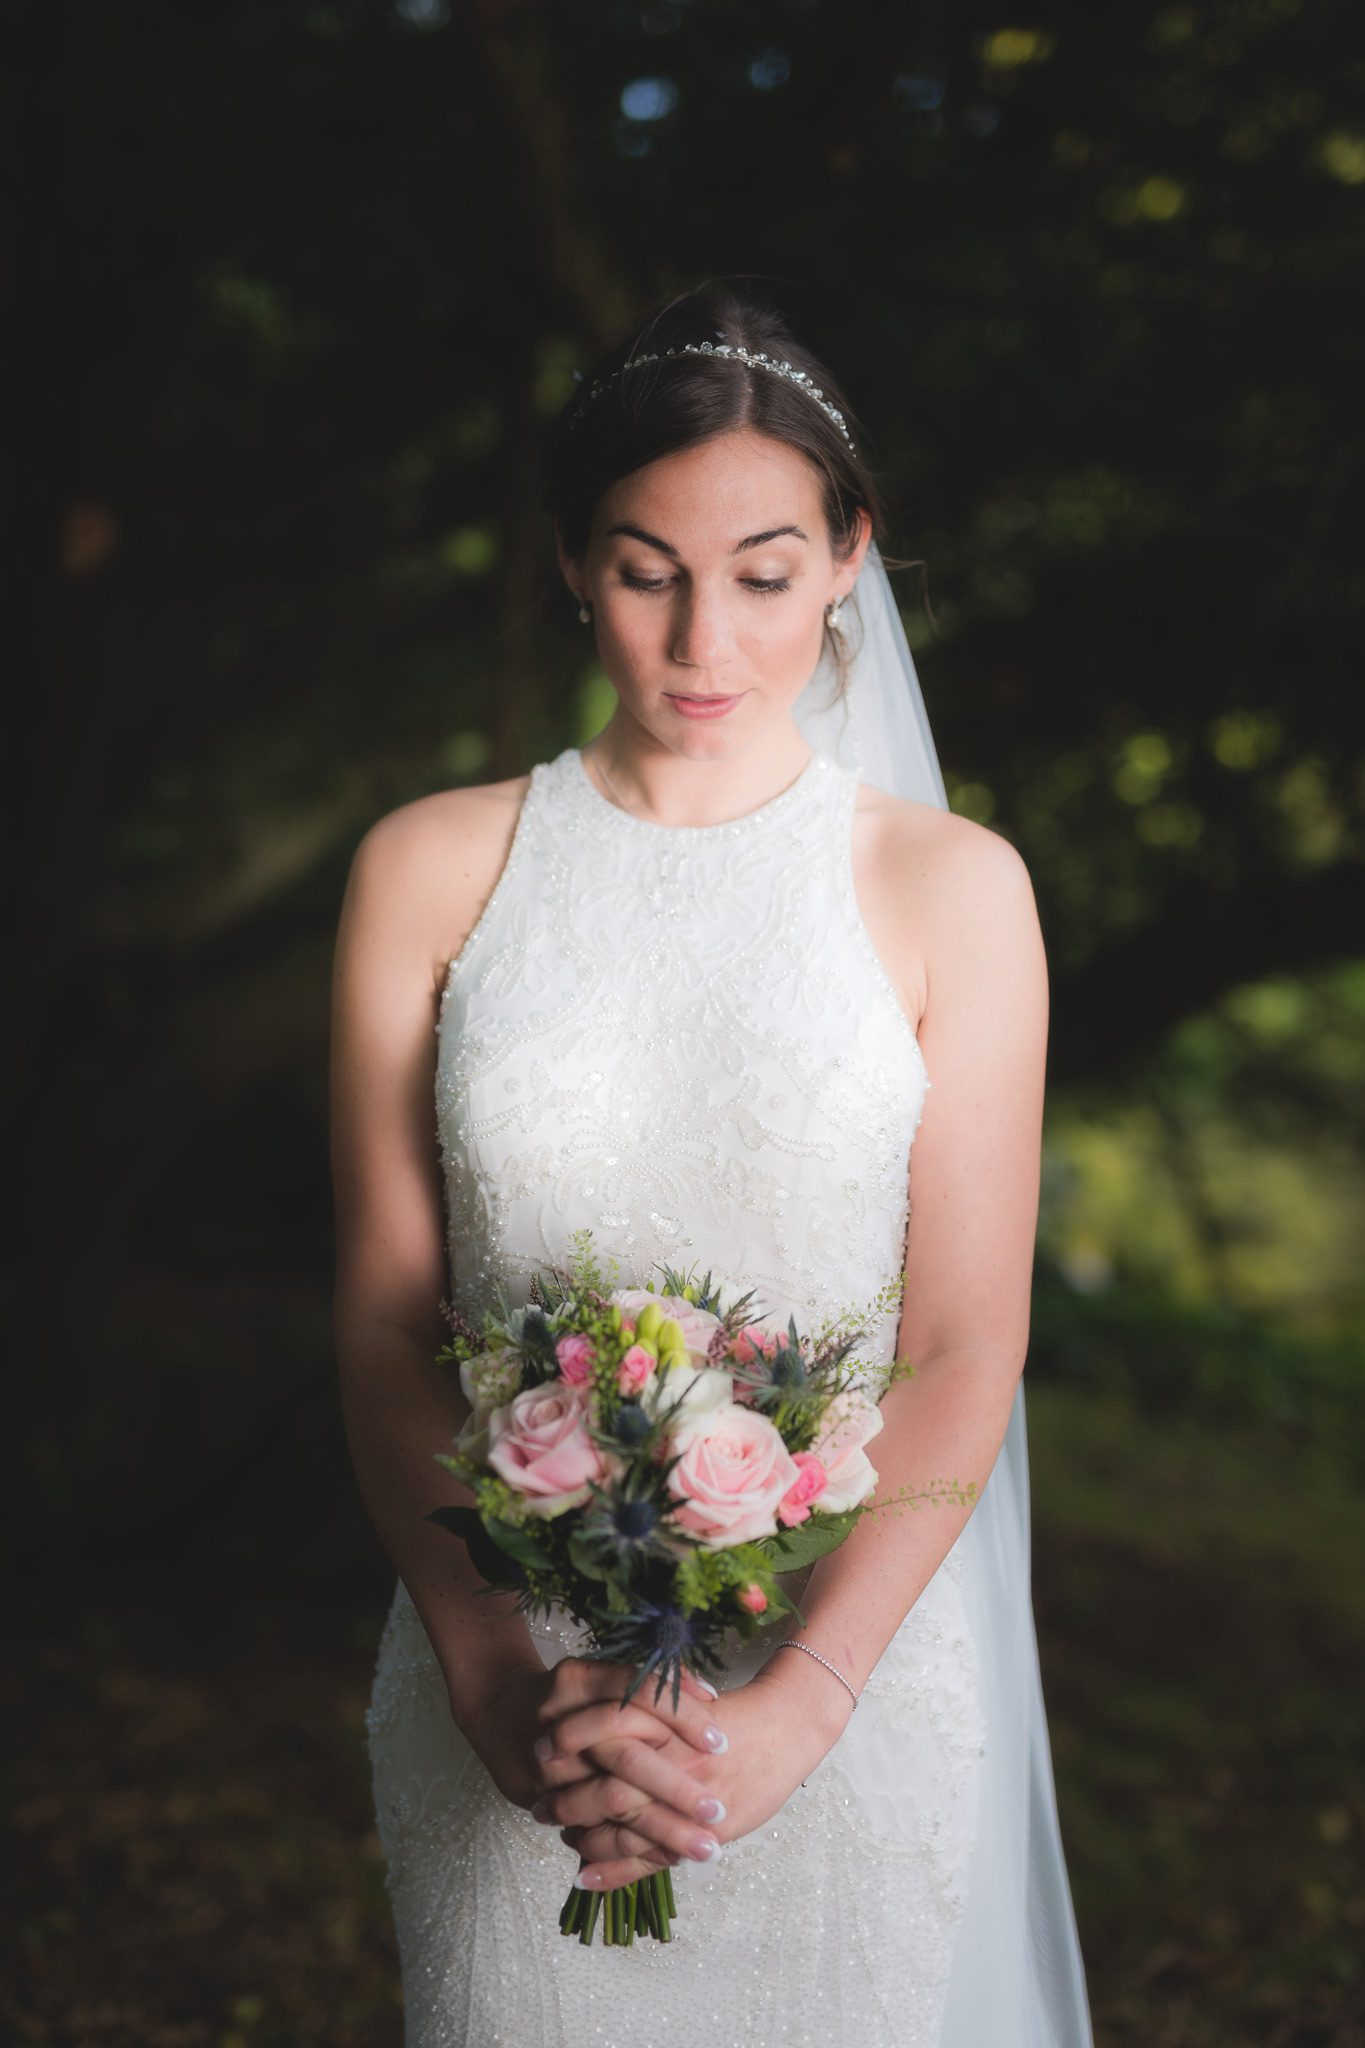 Buxton Wedding Photographer - Bridal Portrait